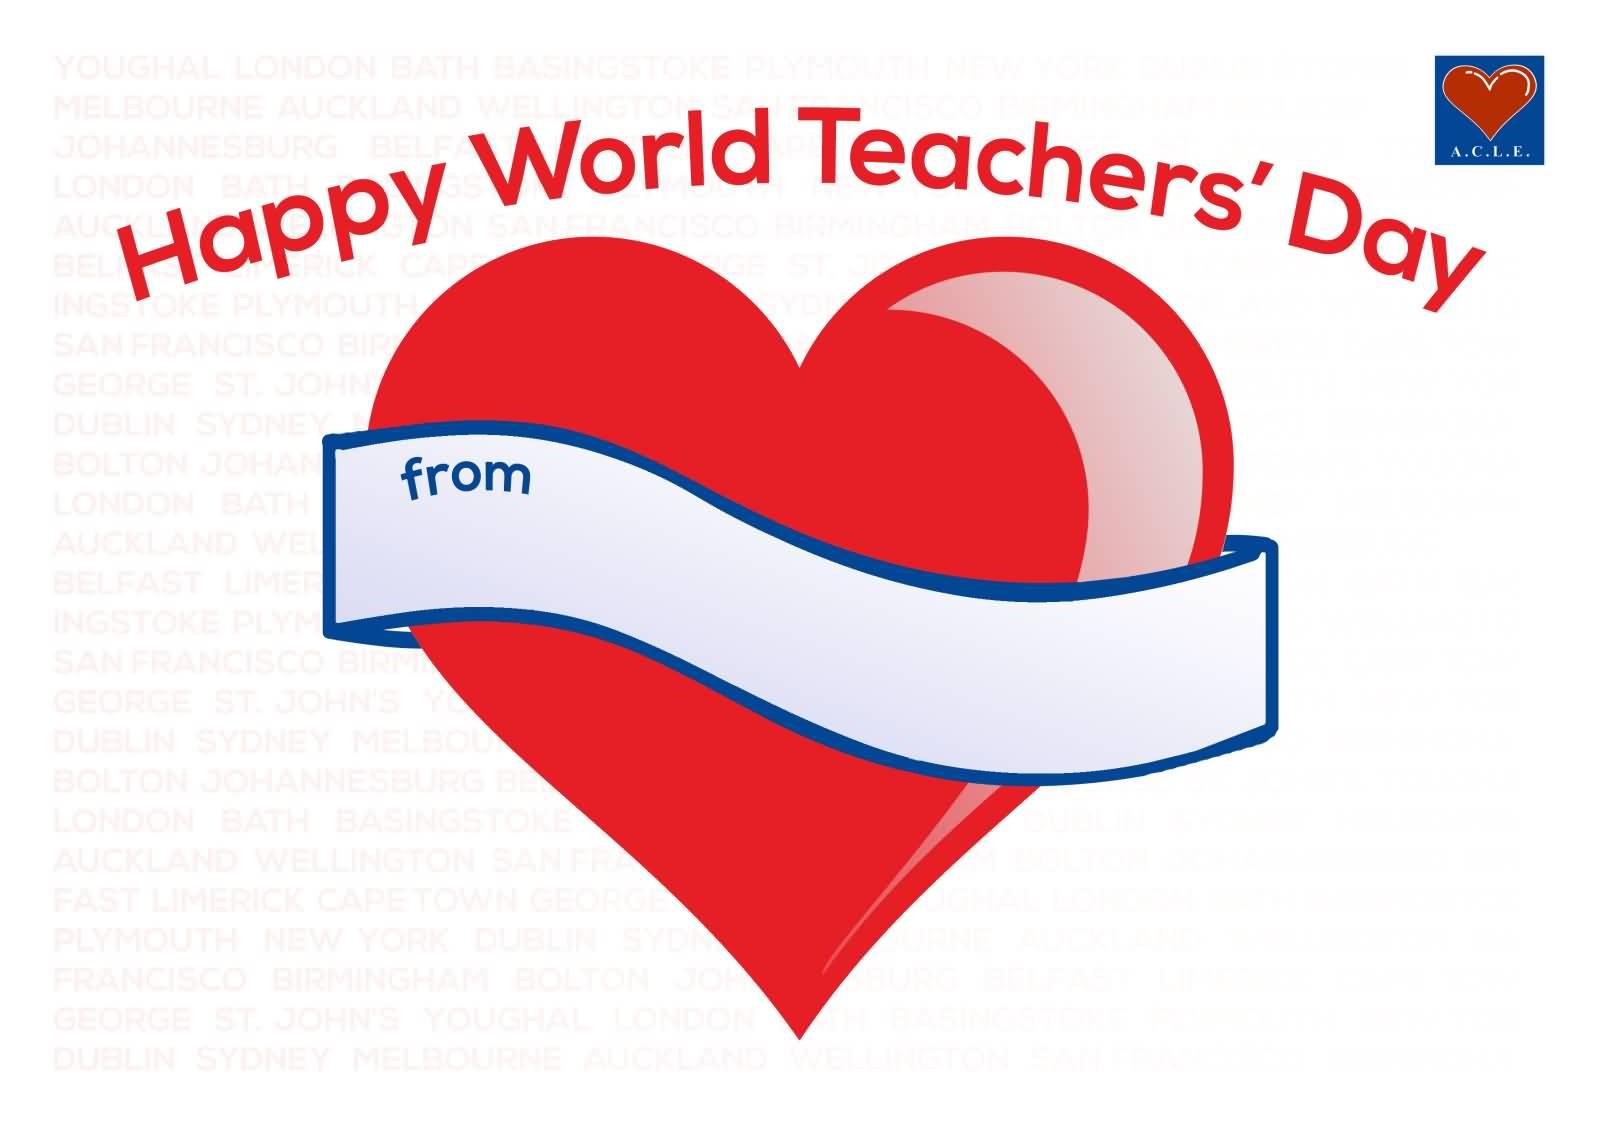 Happy world teachers day greetings heart message image picsmine happy world teachers day greetings heart message image kristyandbryce Images